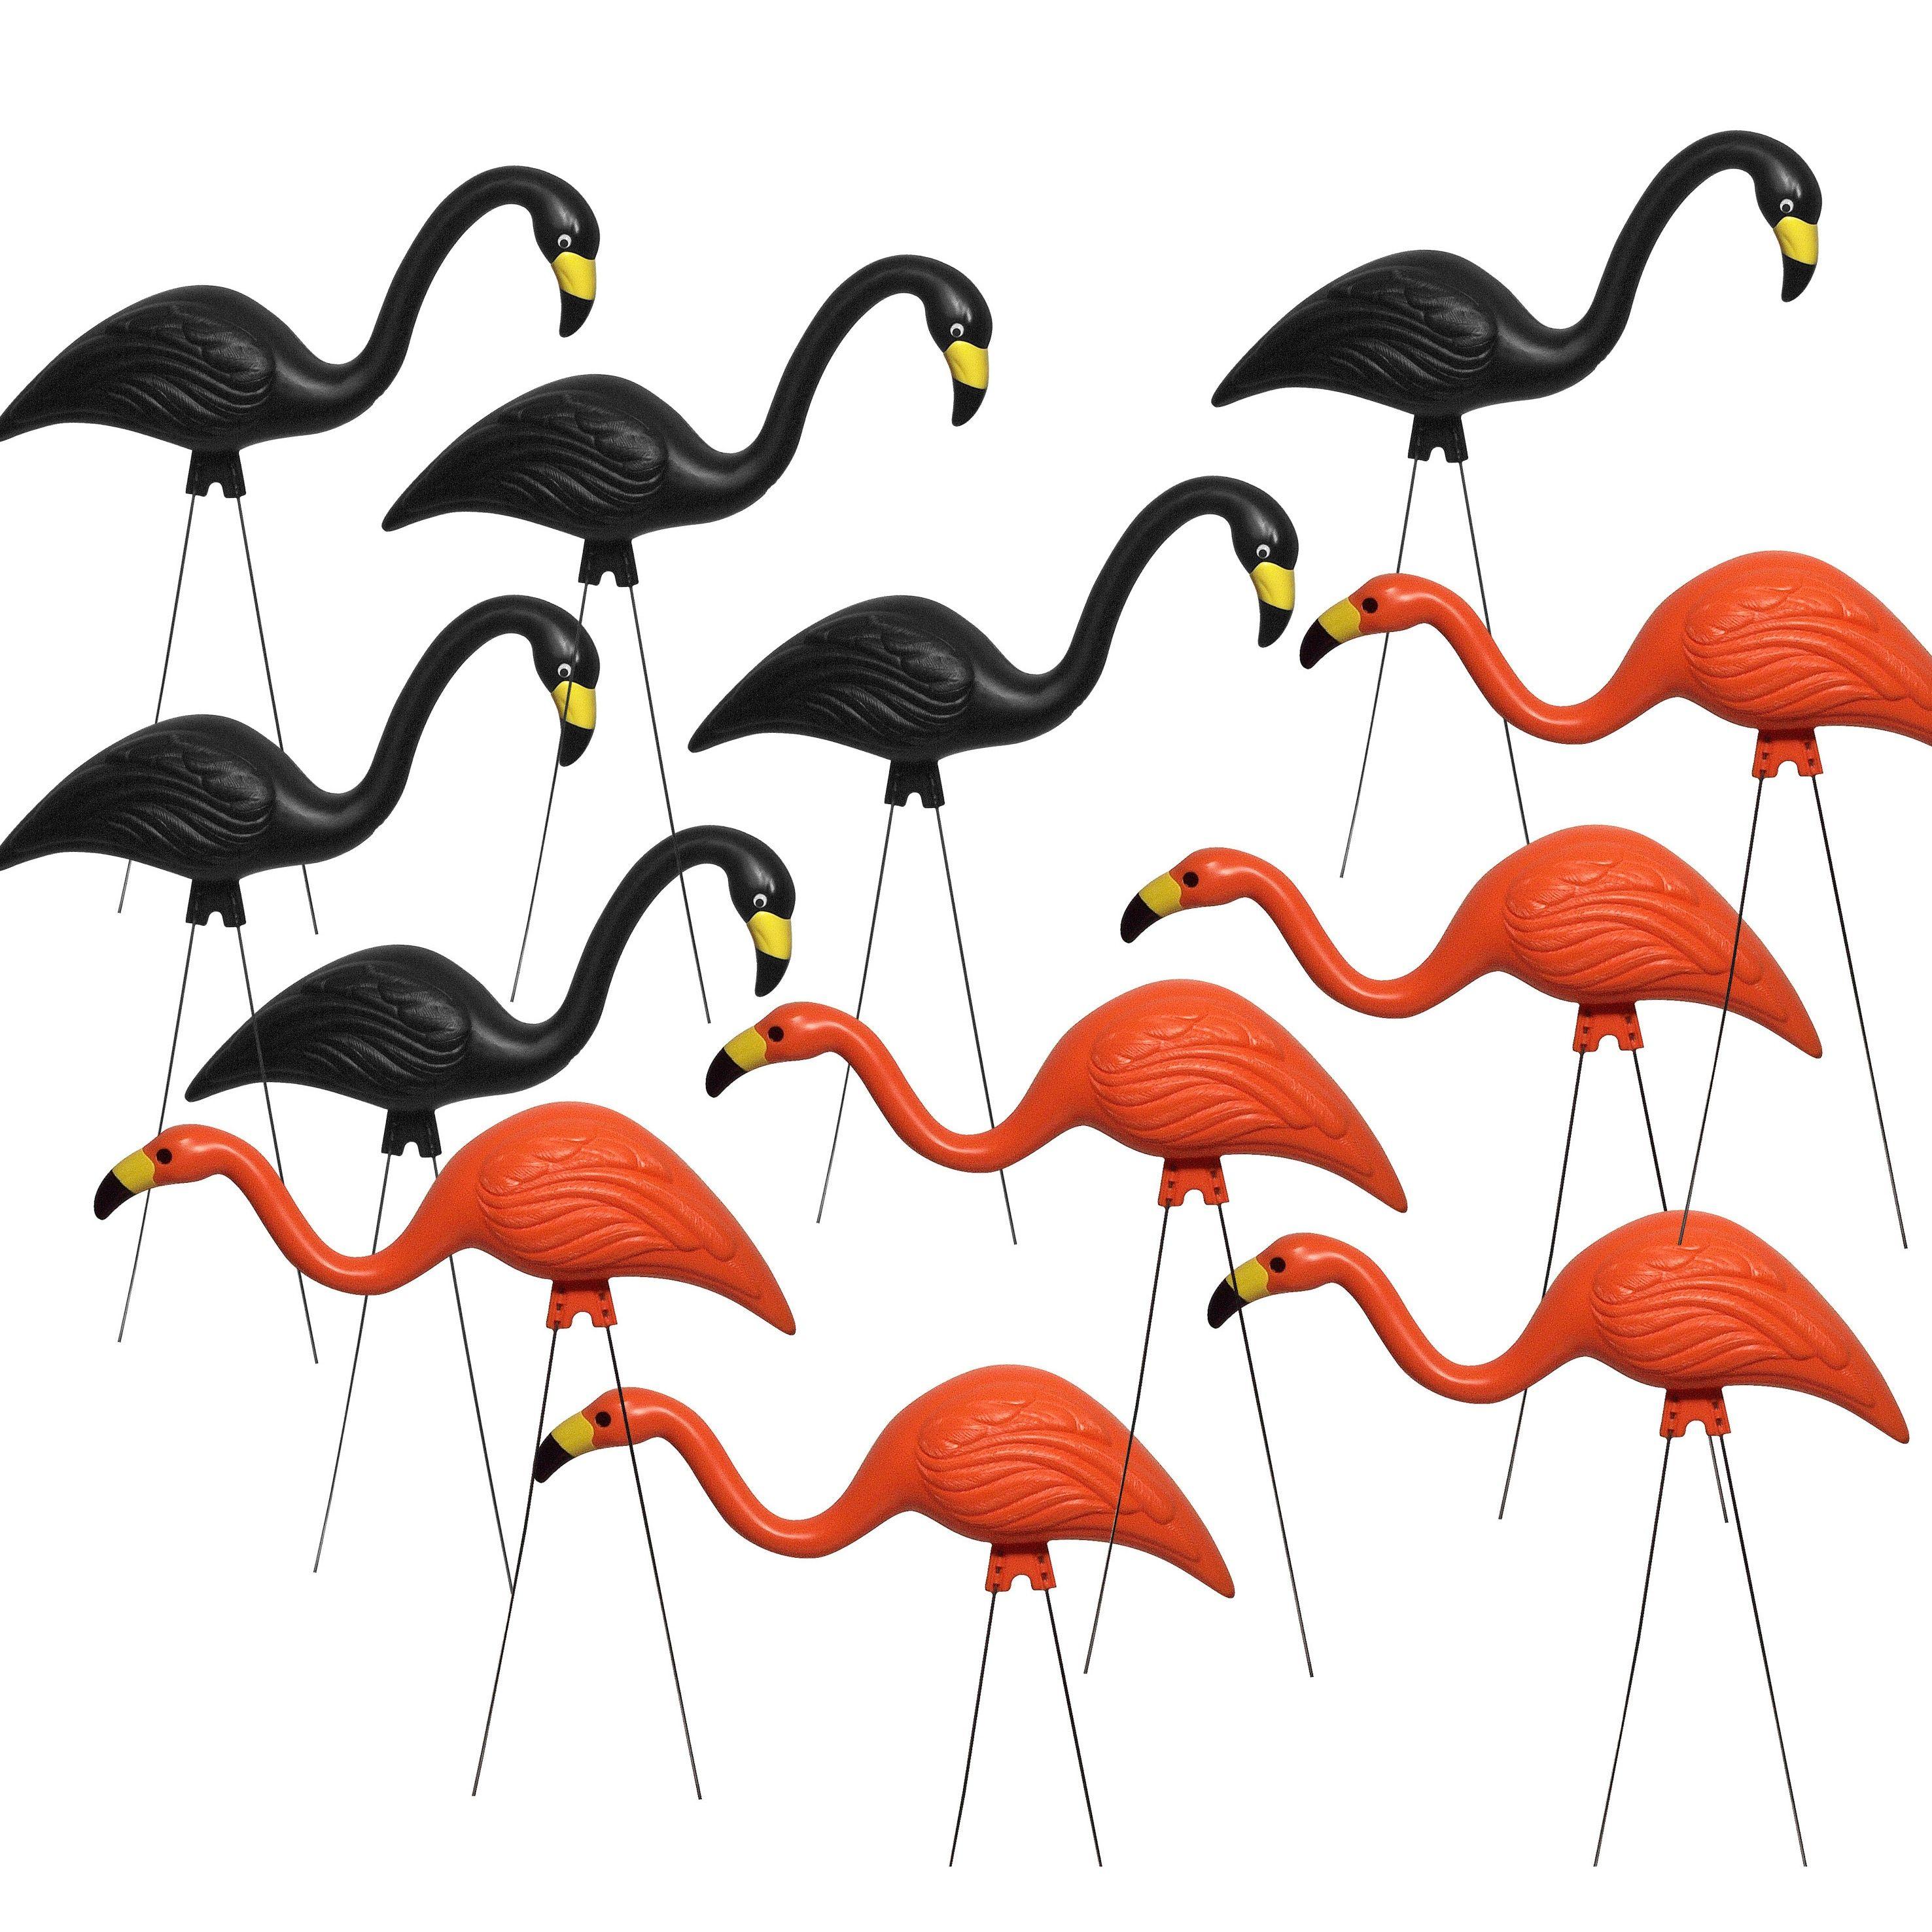 Bloem Y Orange And Black Flamingo Garden Decor 12 Pack Plastic Outdoor Décor